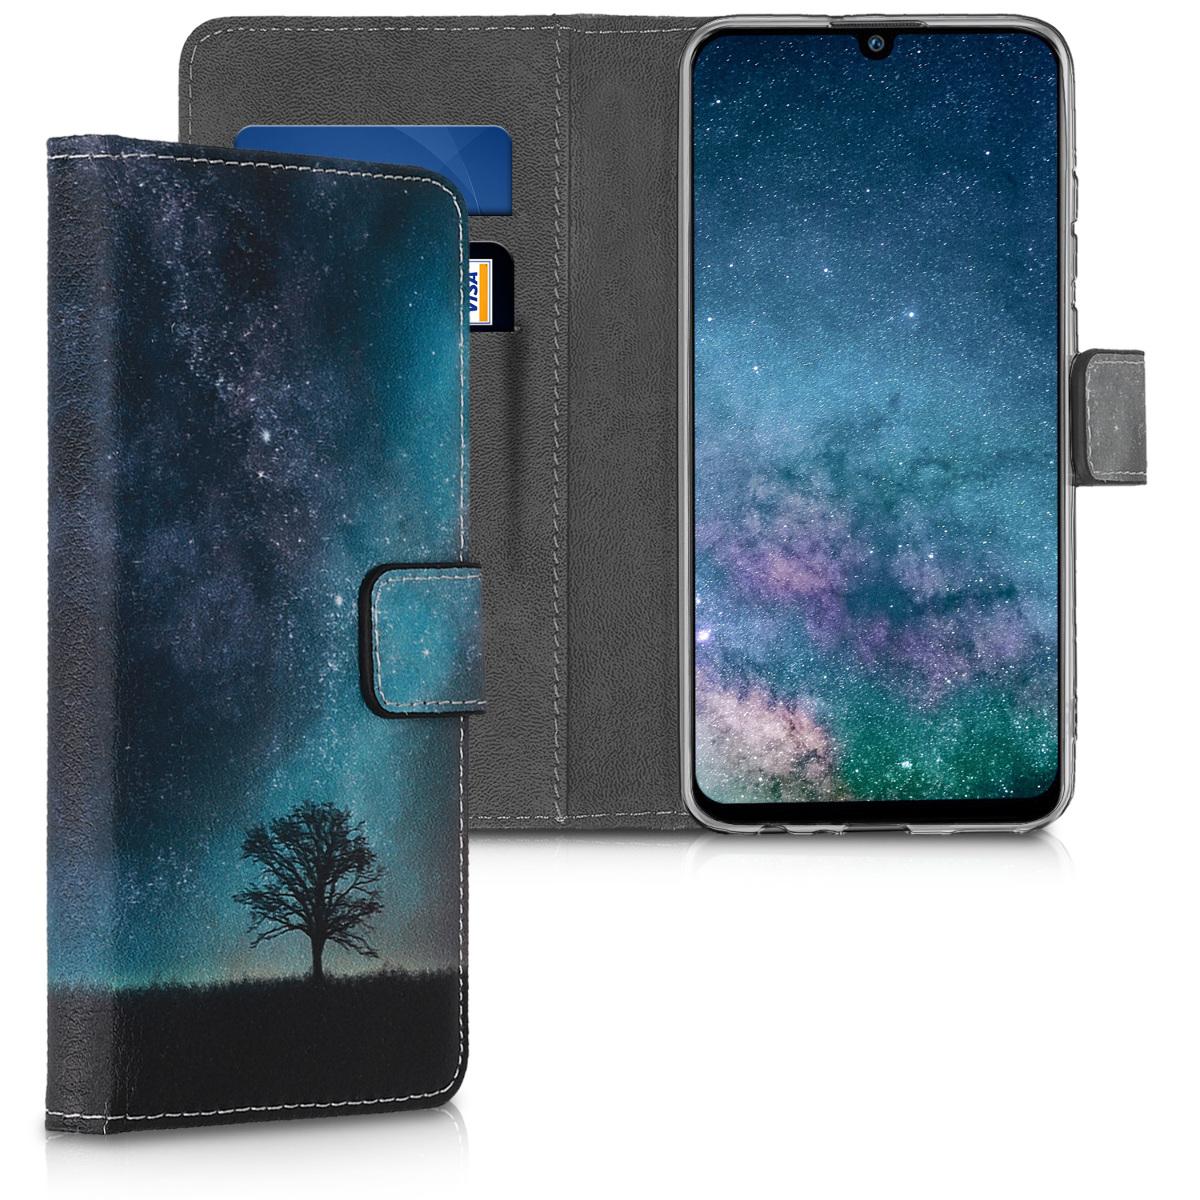 KW Θήκη - Πορτοφόλι Huawei P Smart 2019 - Galaxy Tree (47395.02)